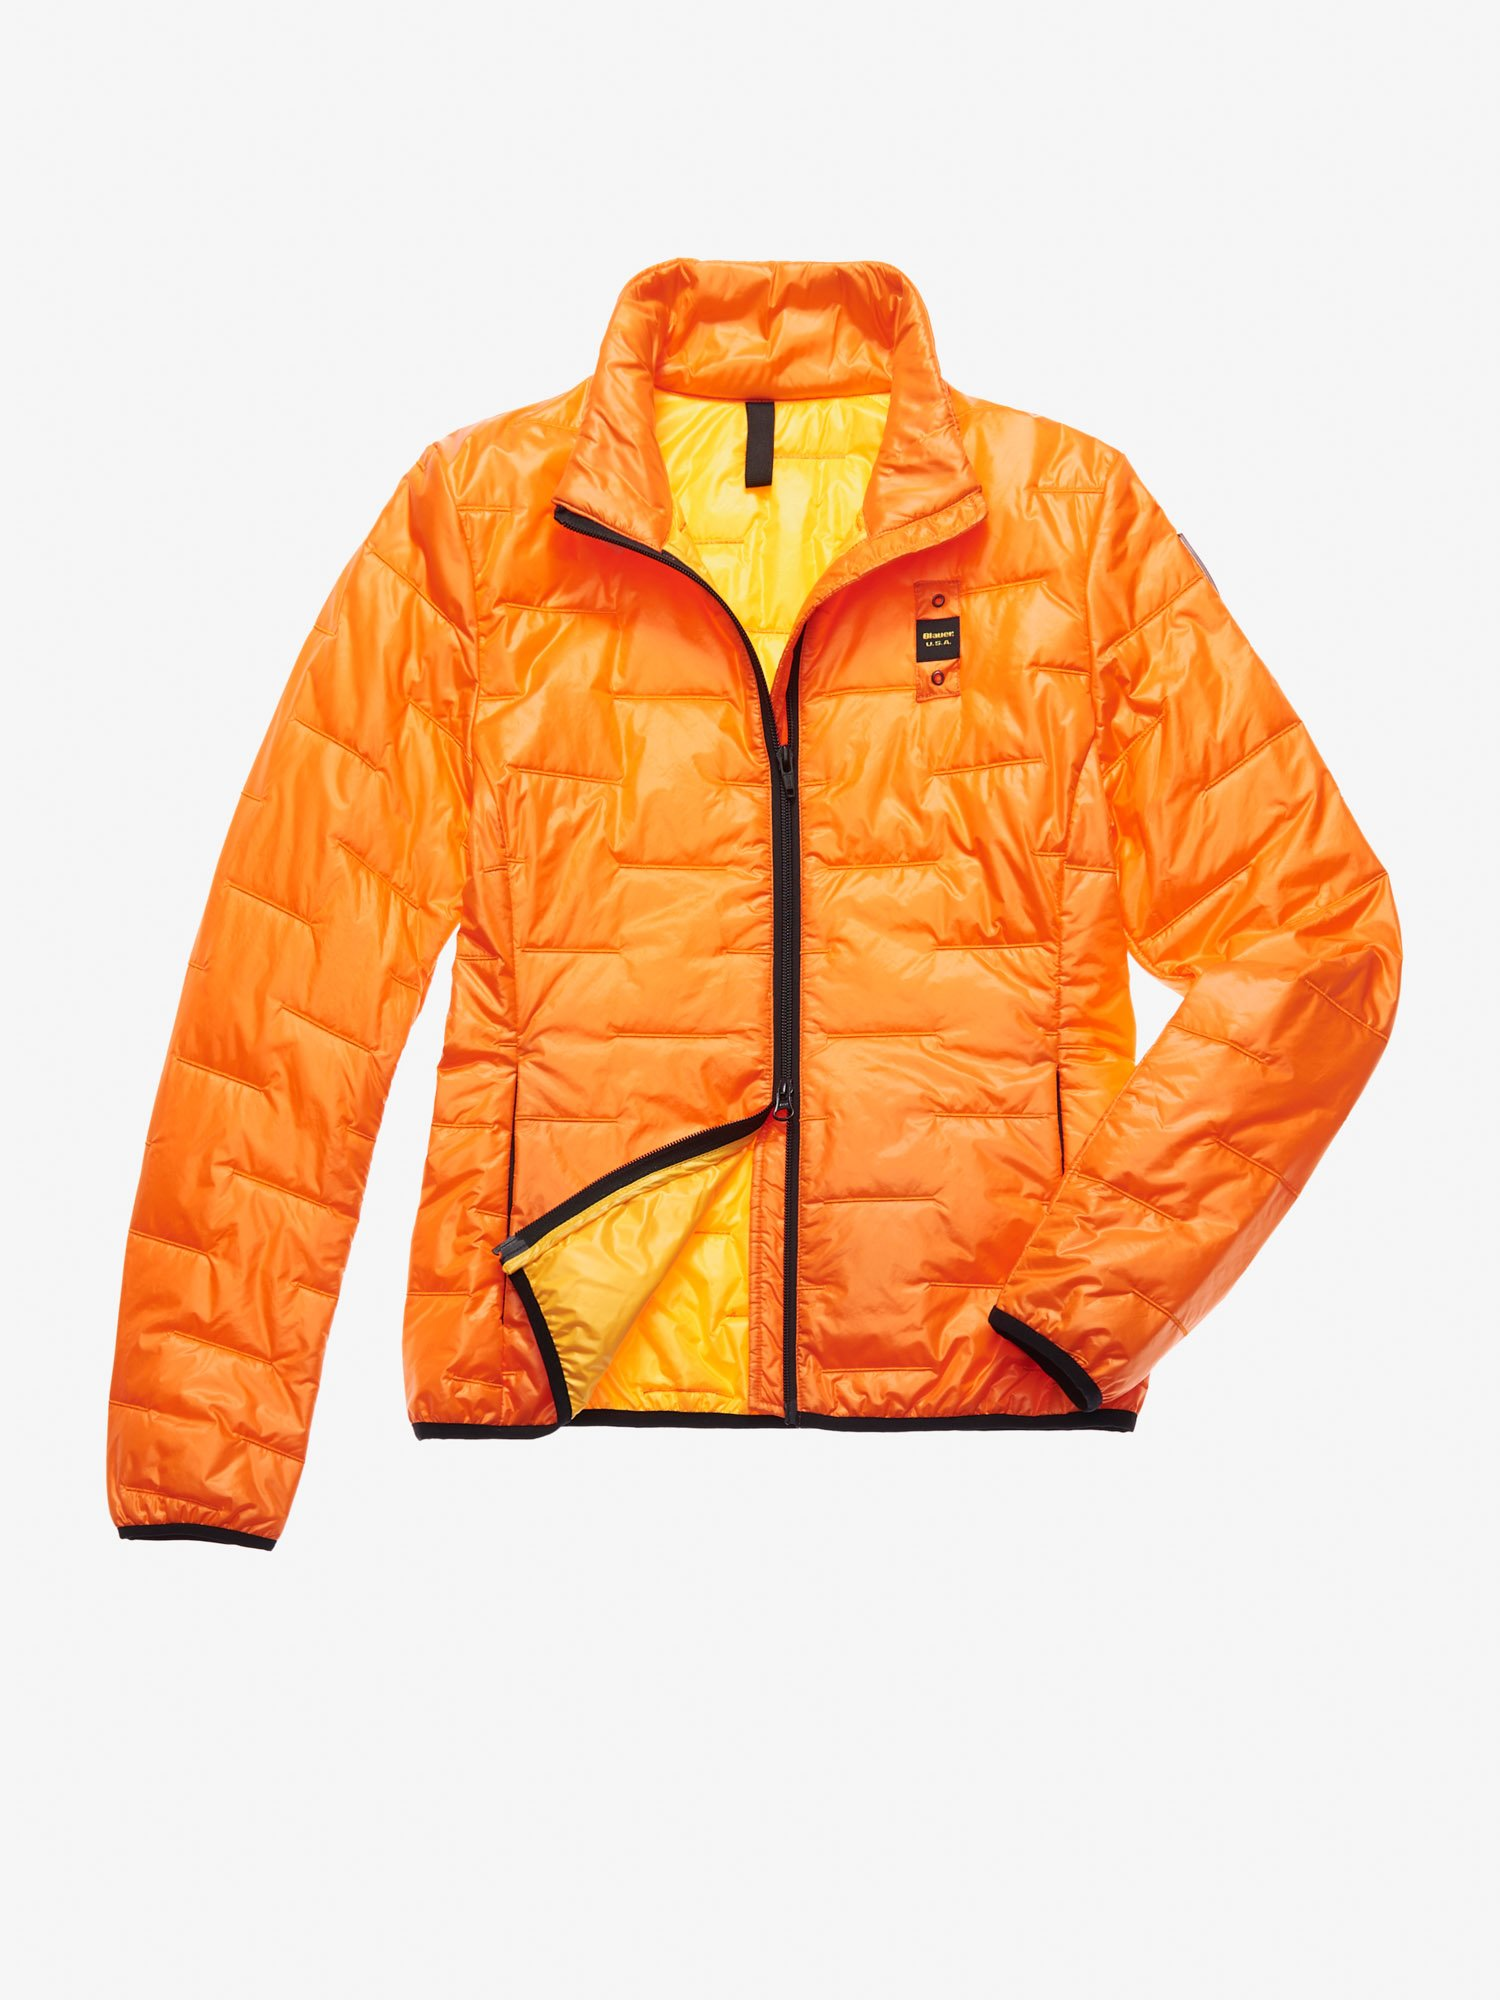 Blauer - SANCHEZ SHINY 100 GR PADDED JACKET - Orange Carrot - Blauer